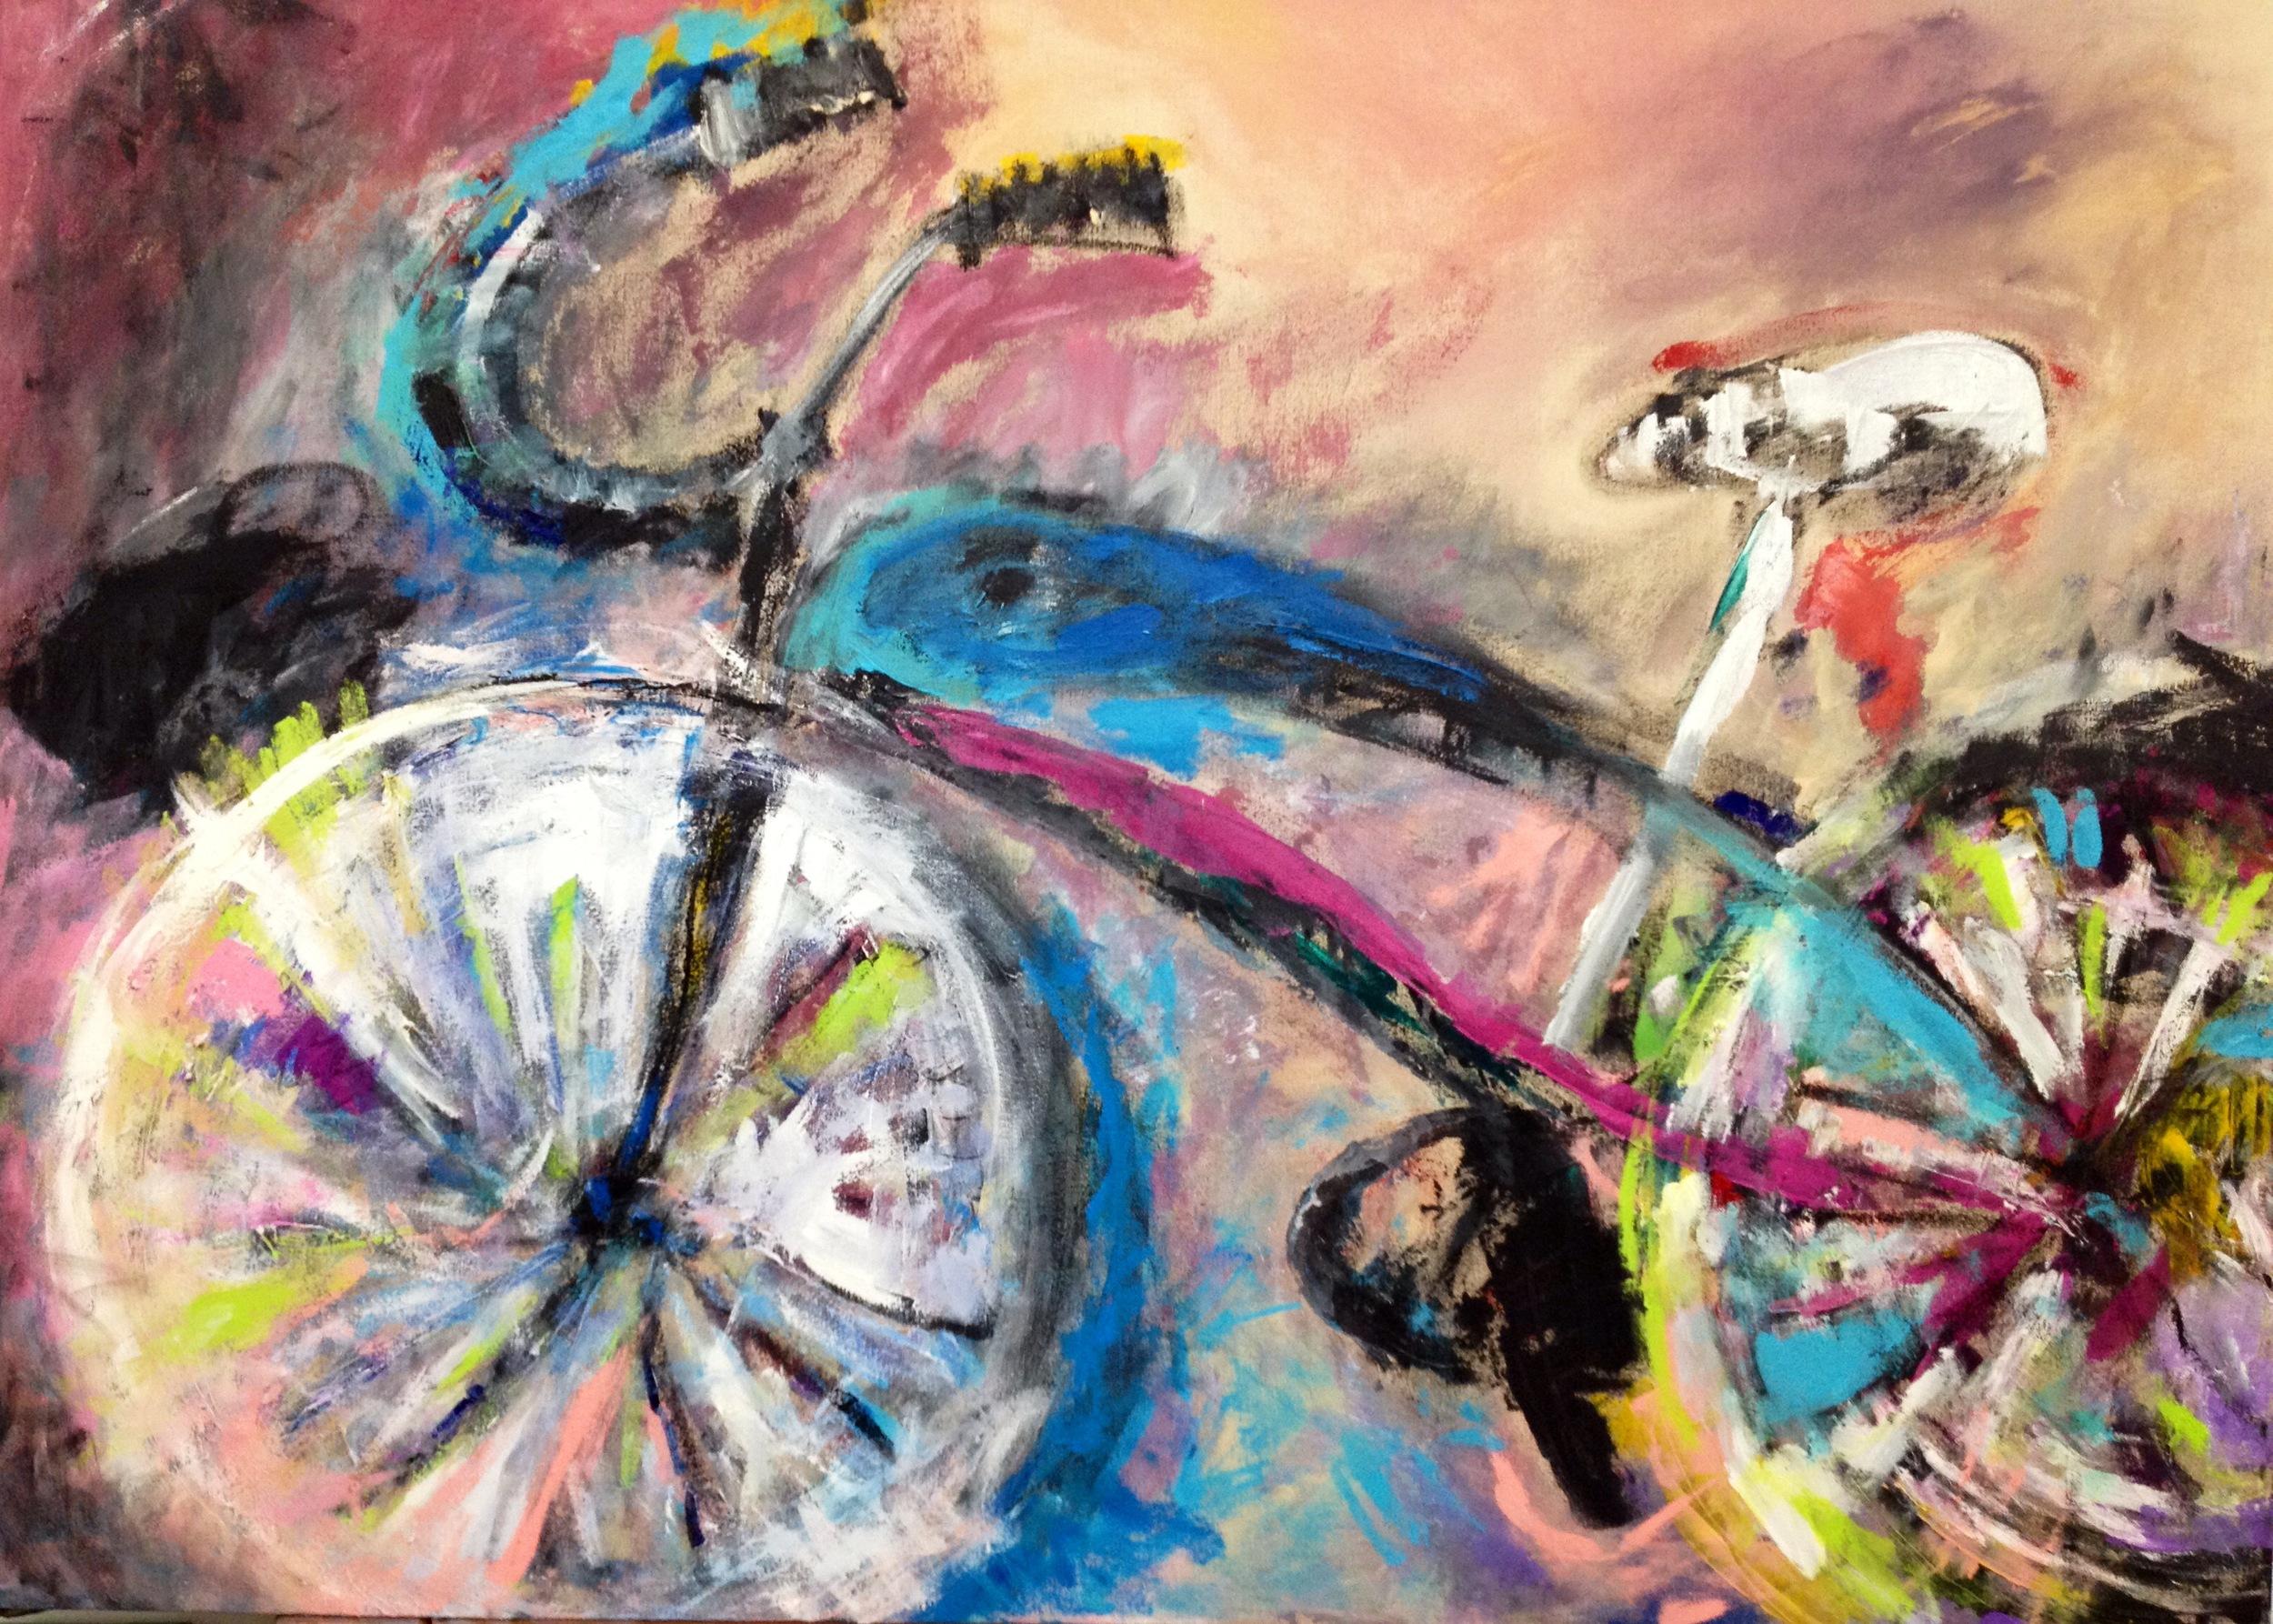 Bigger than Life Bike<br/>60x45 Acrylic on canvas